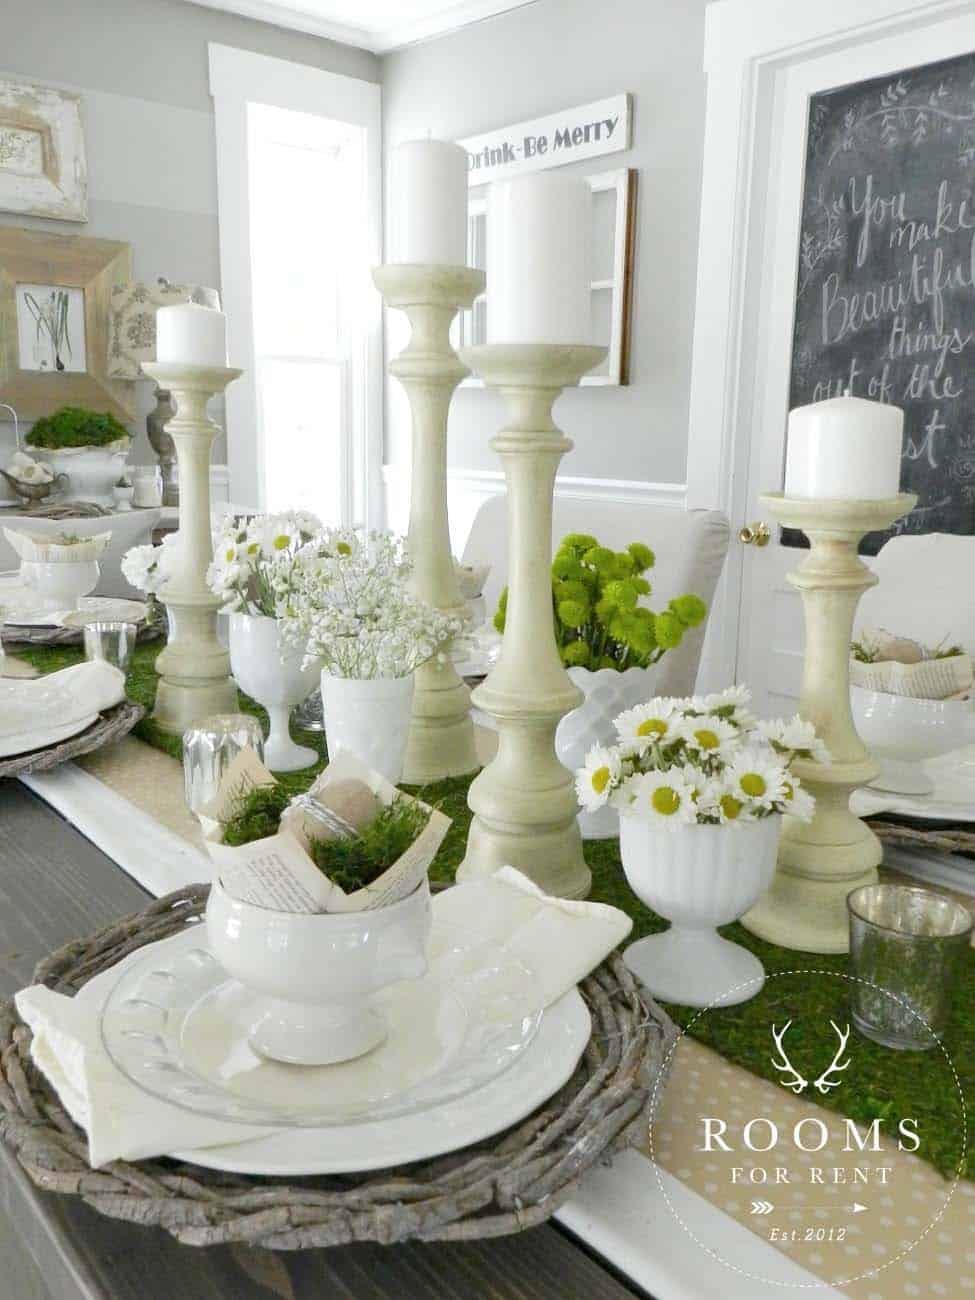 Inspiring Easter Table Centerpiece Ideas-15-1 Kindesign